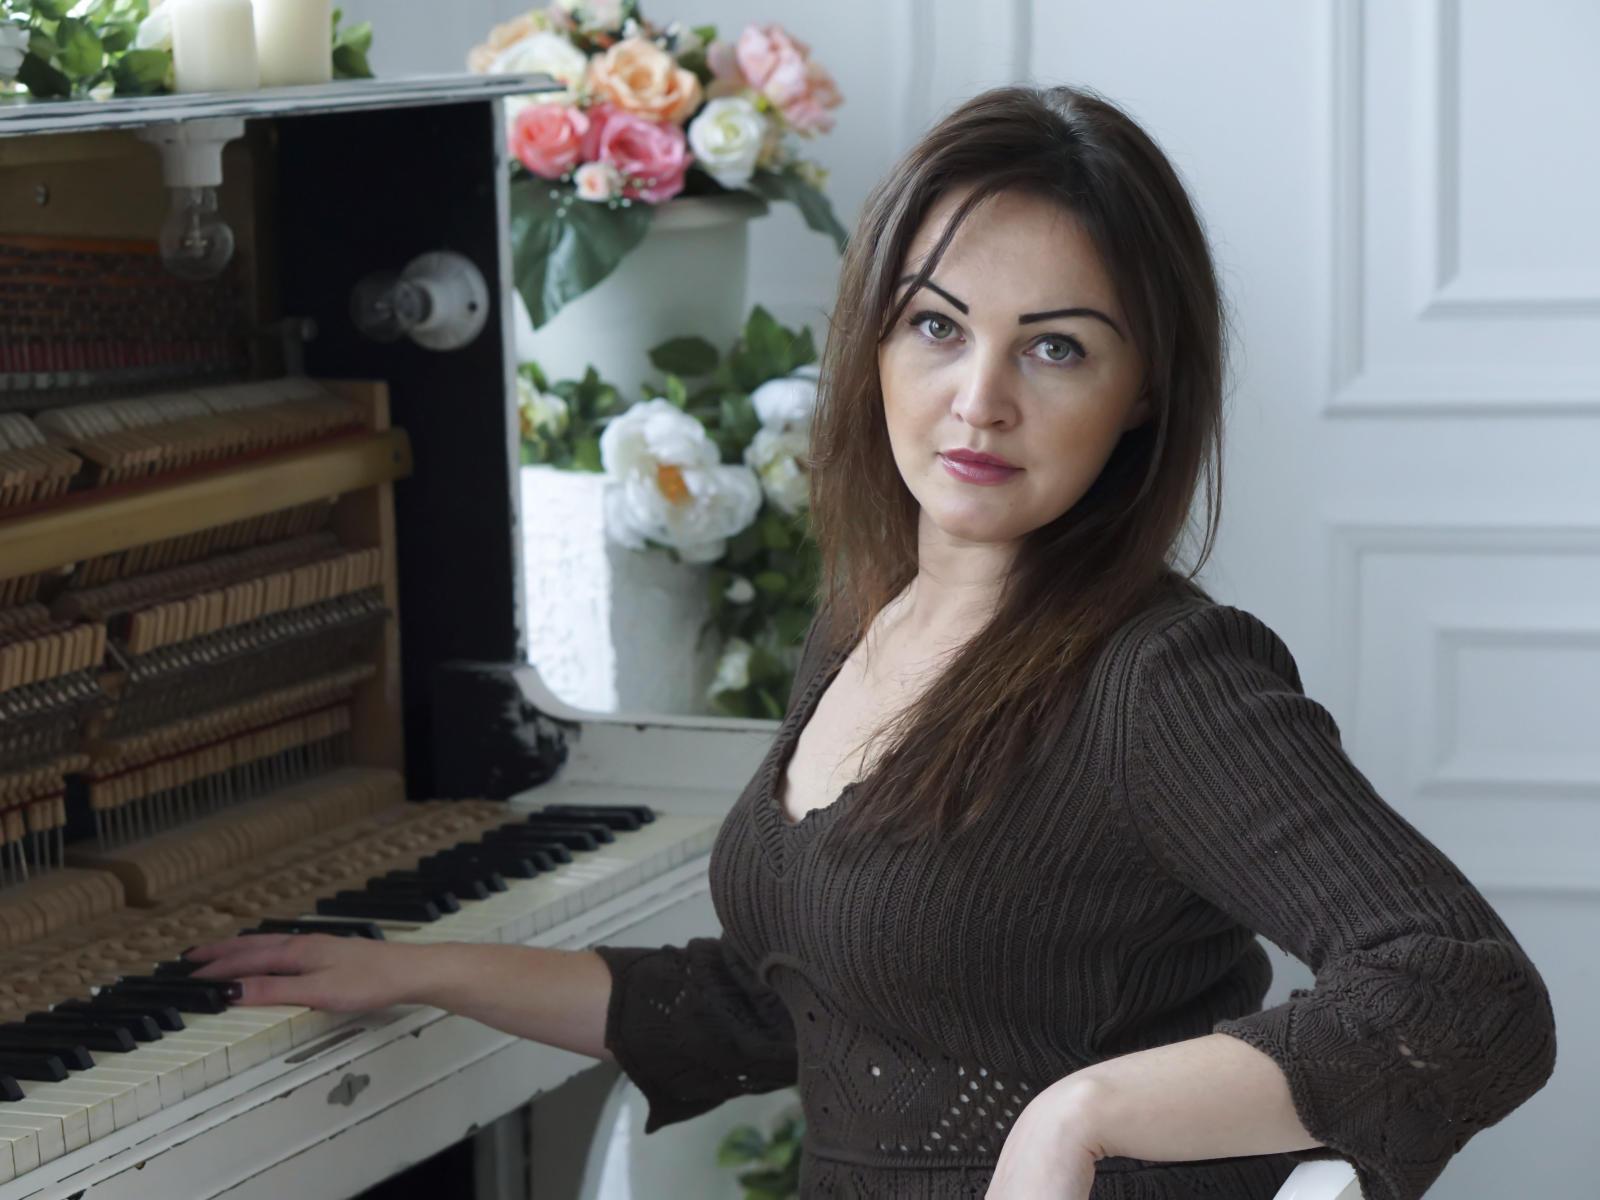 Ingyenes pornó tv-streaming